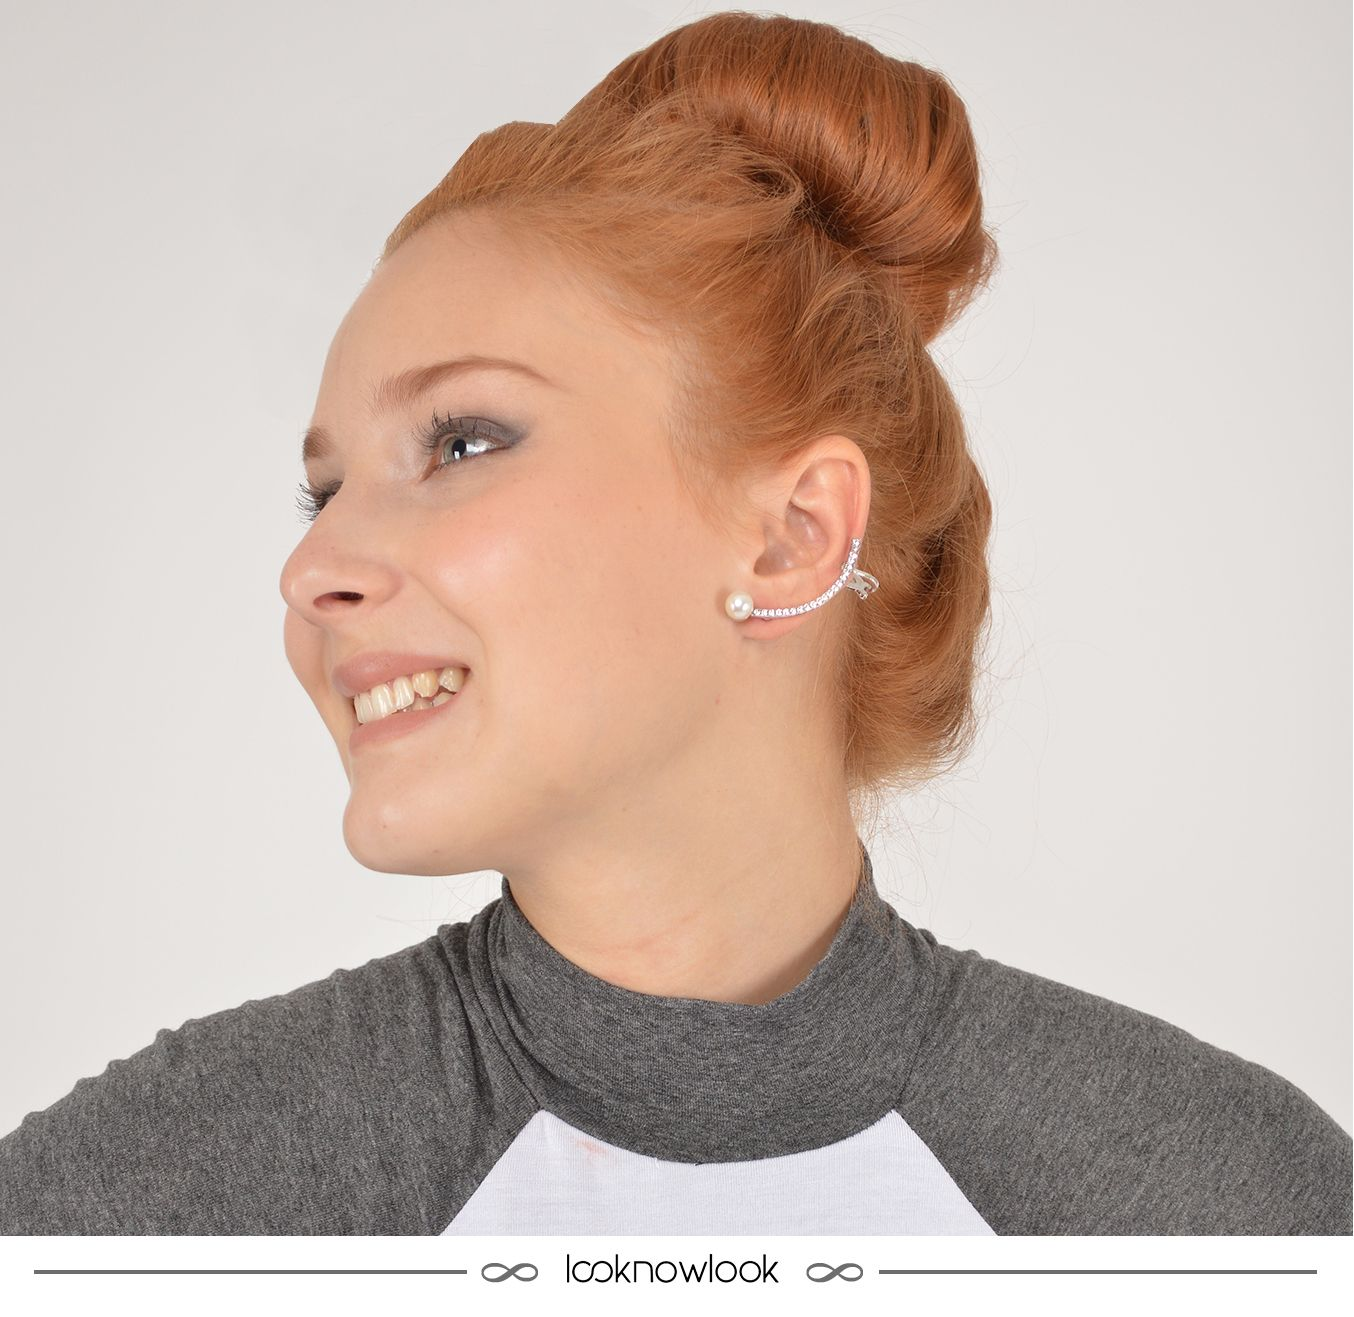 Brinco ear cuff lindo para deixar seu look mais estiloso! #moda #look #outfit #detalhes #estilo #bijoux #acessórios #styling #brinco #earcuff #shop #lojaonline #ecommerce #lnl #looknowlook